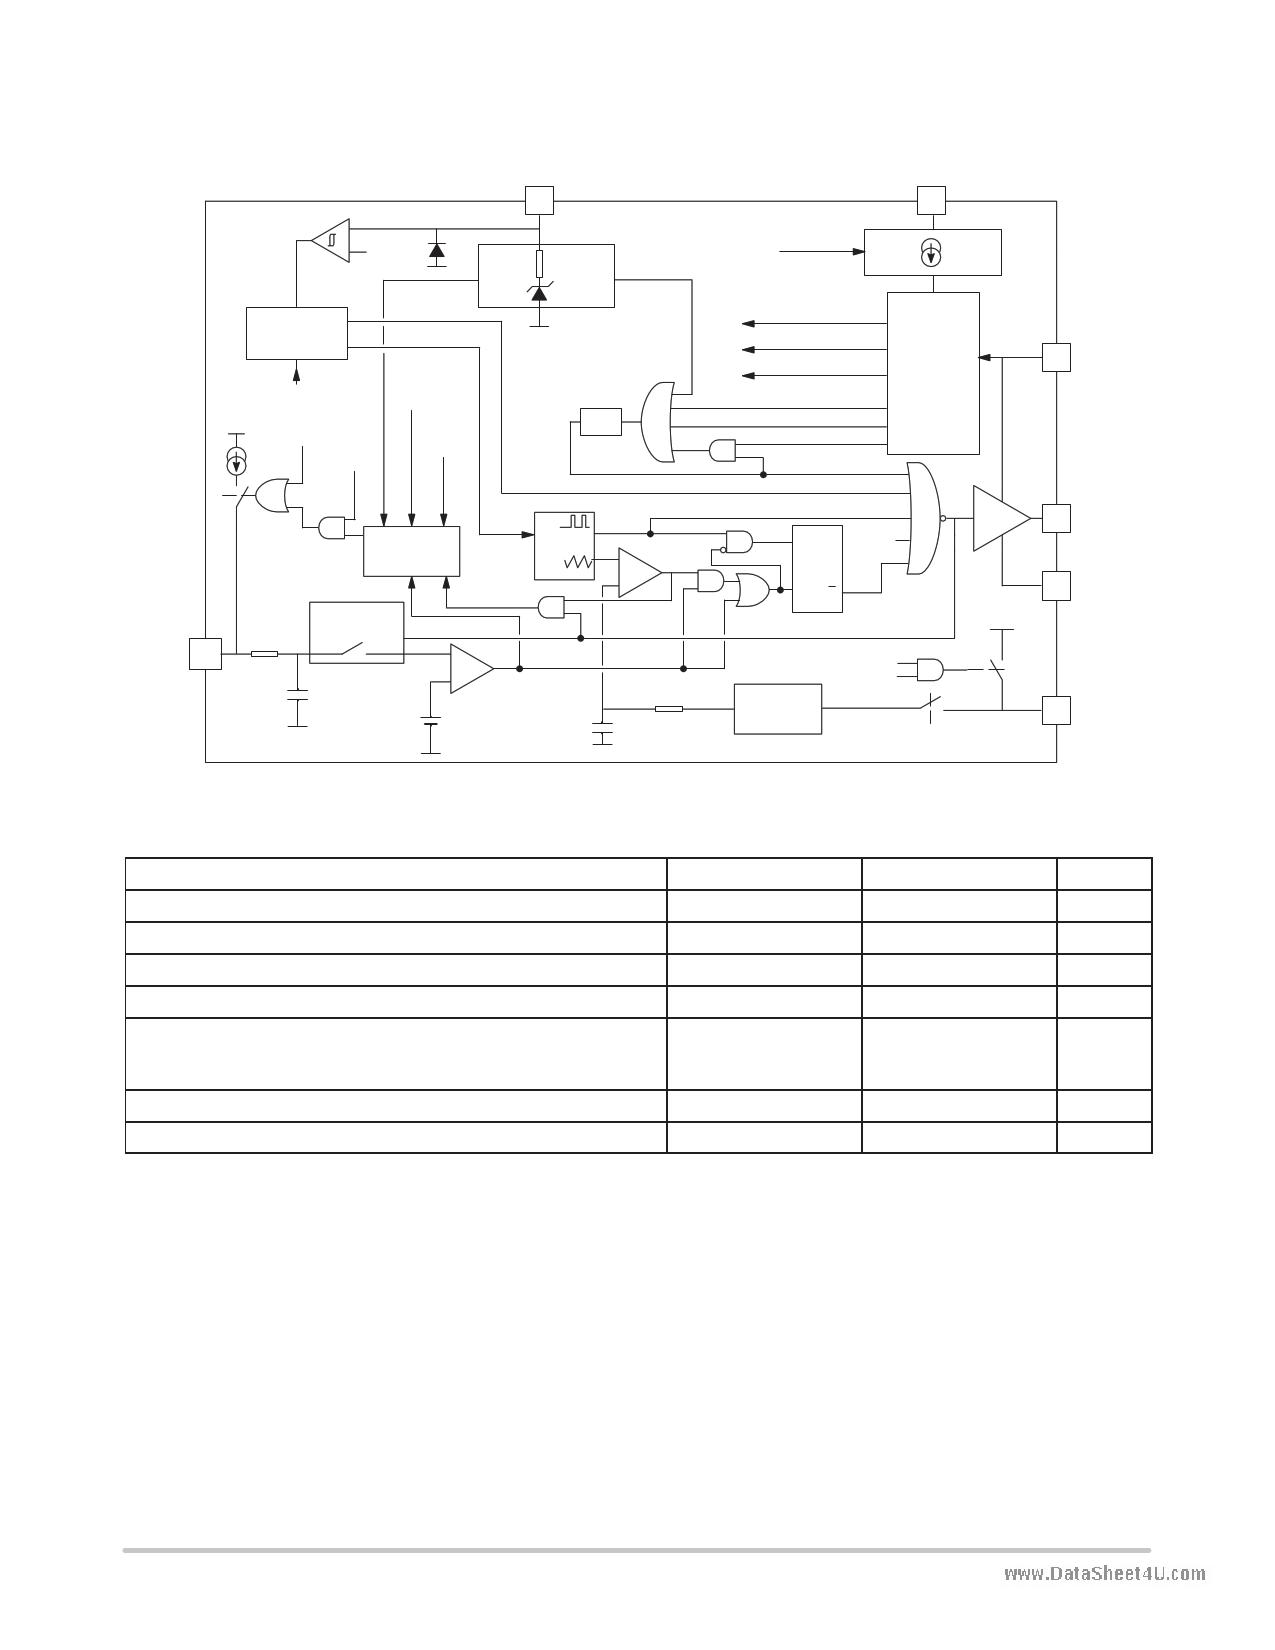 44608P40 pdf schematic